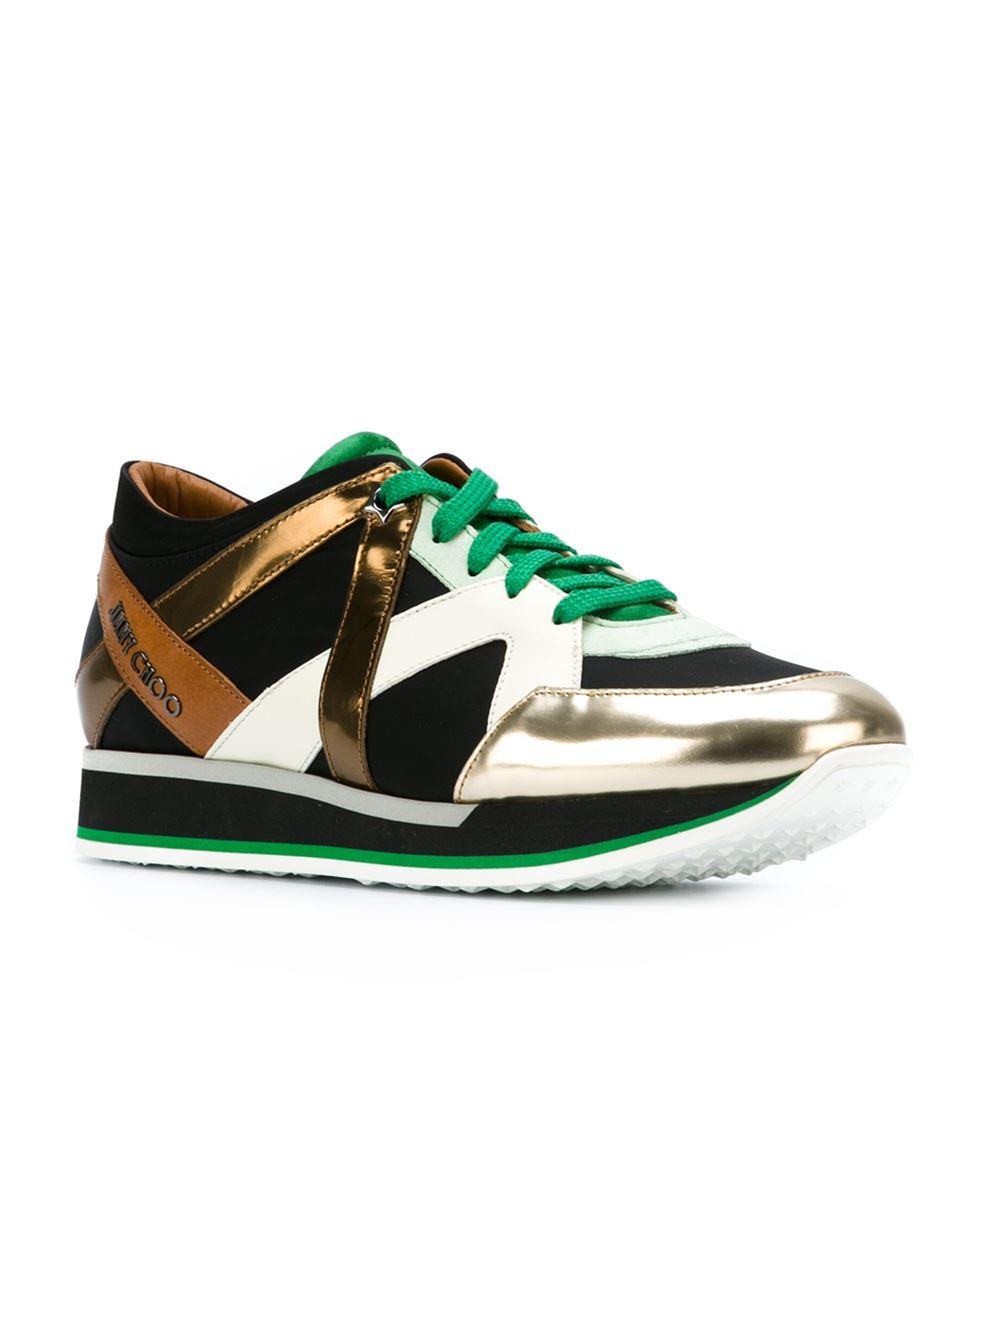 jimmy choo 39 london 39 sneakers in multicolor multicolour lyst. Black Bedroom Furniture Sets. Home Design Ideas